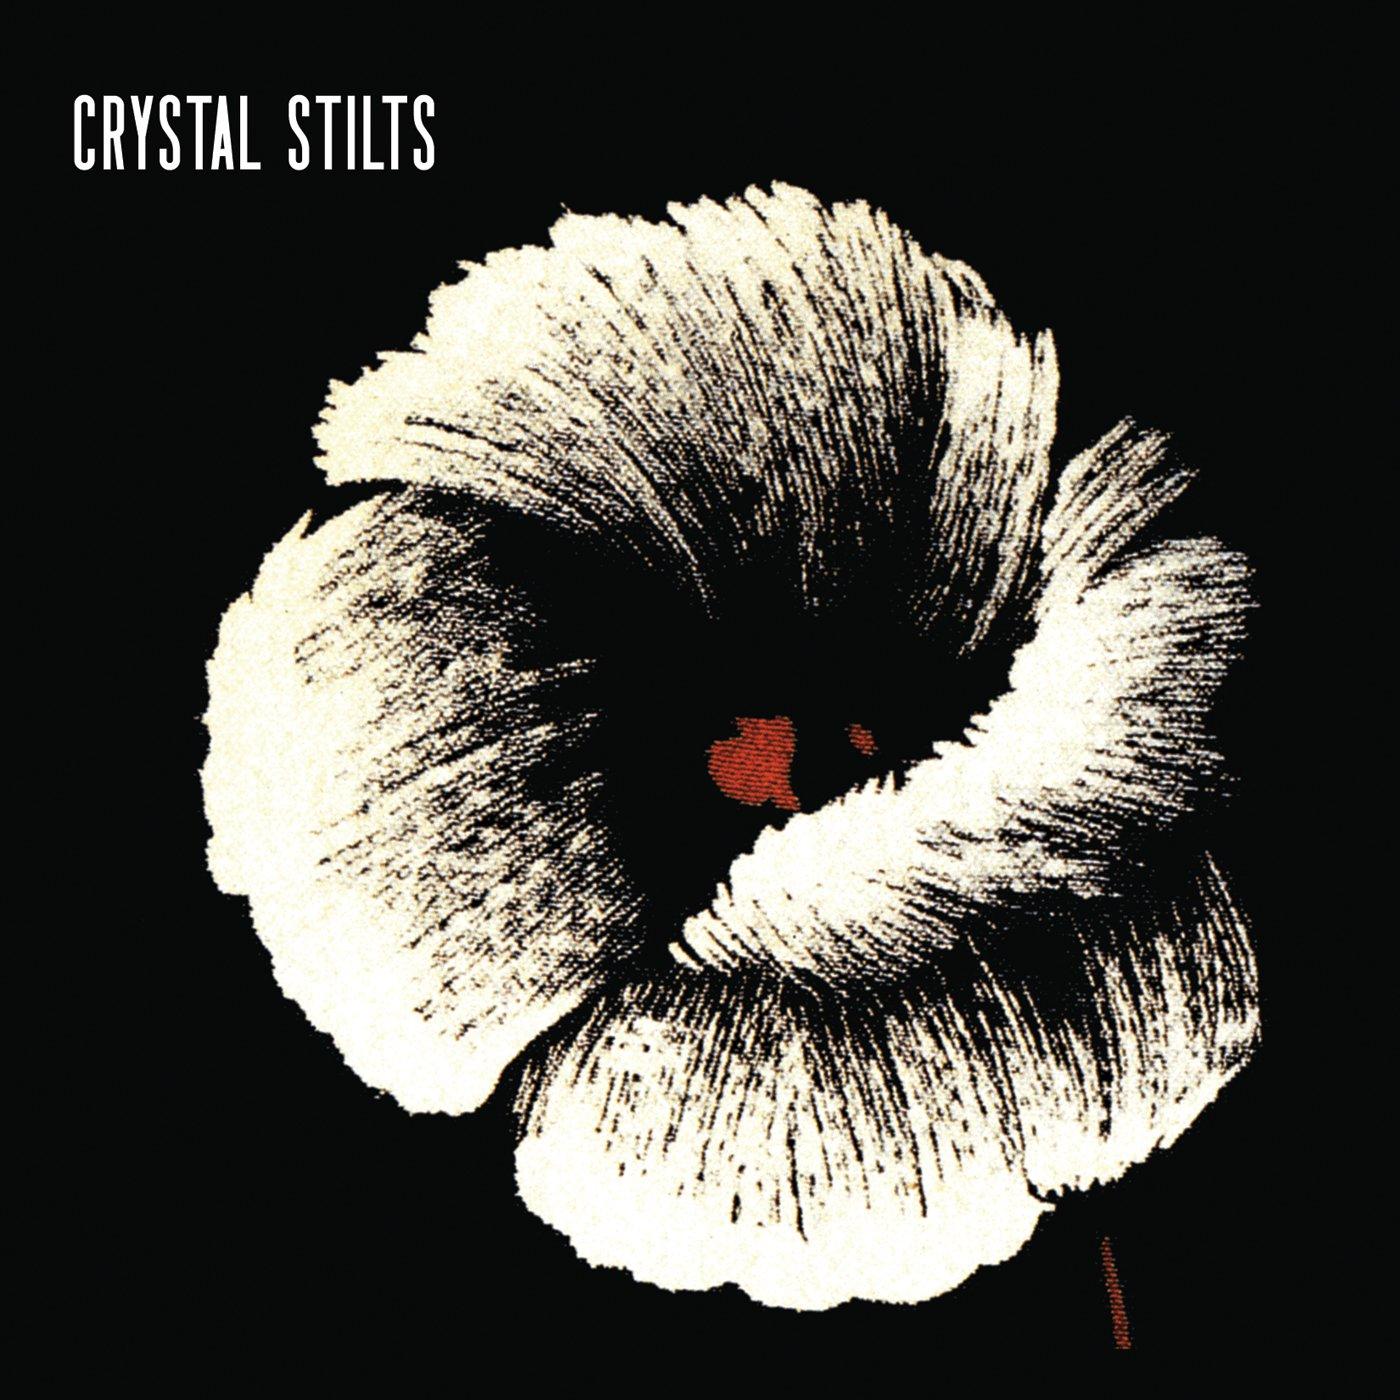 Crystal Stilts - Alight Of Night (2009) [FLAC] Download